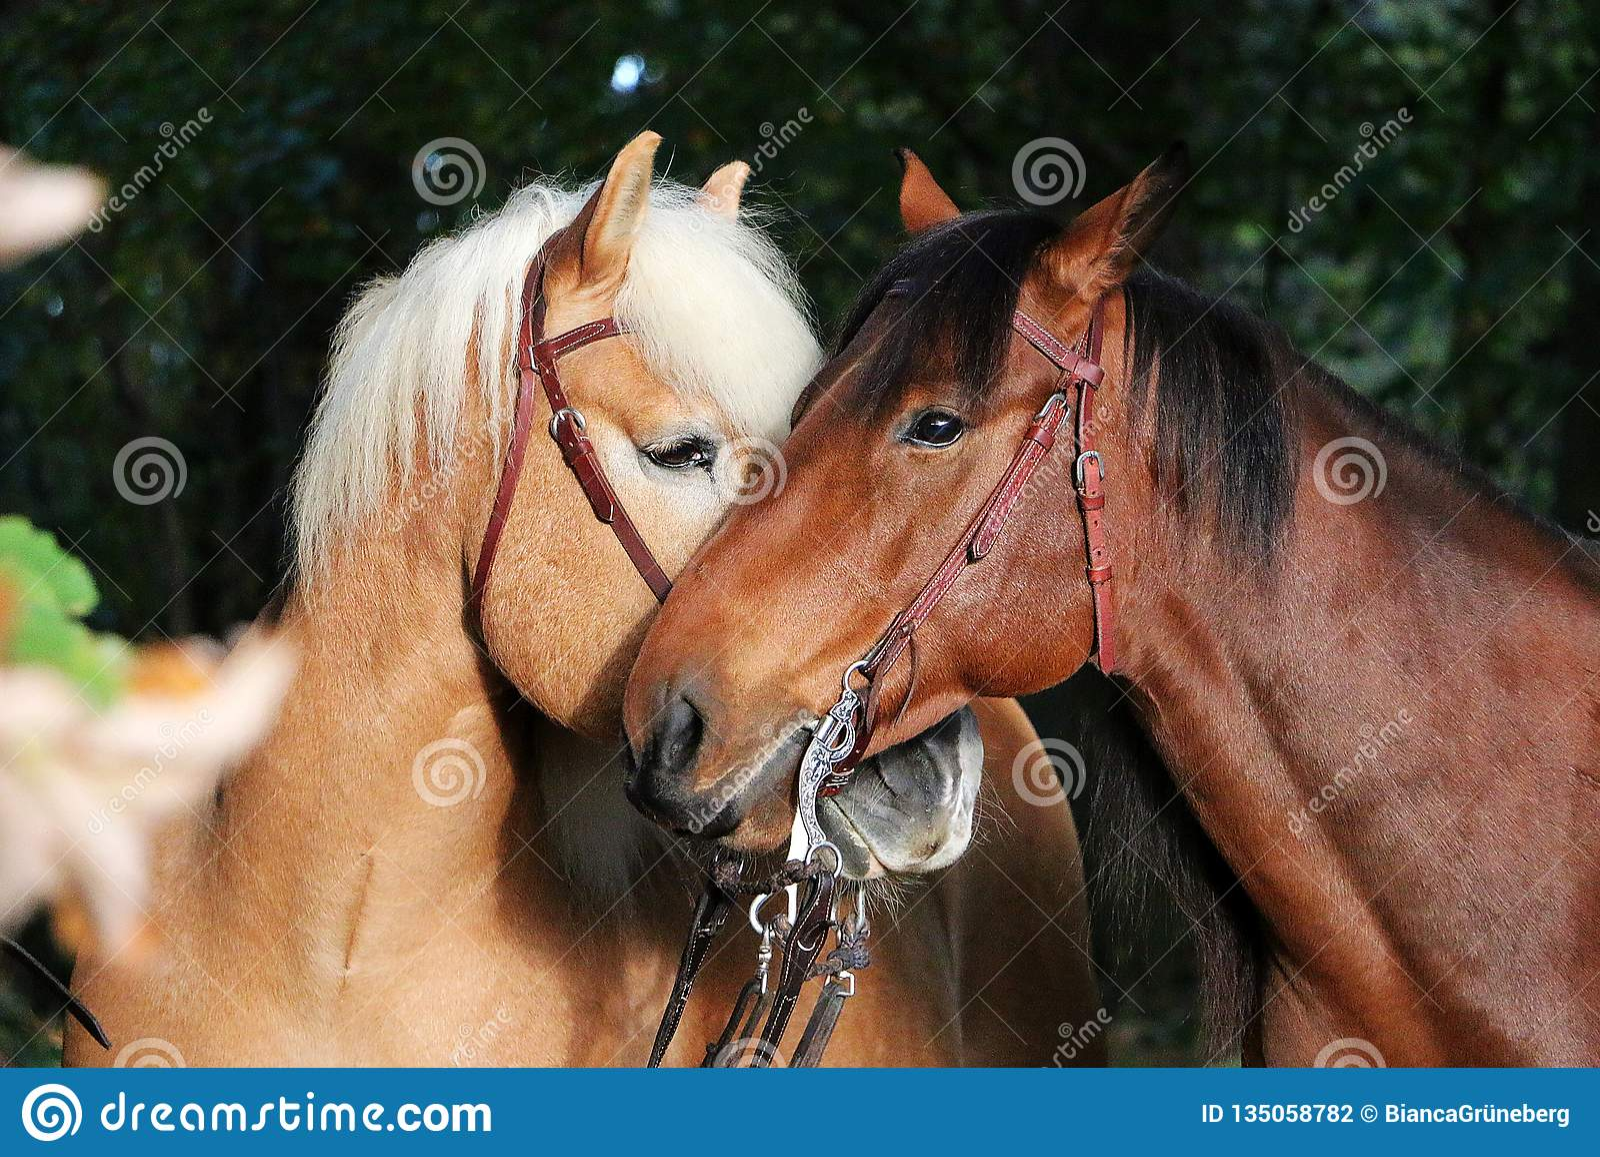 Cavalli stringenti a sé adorabili